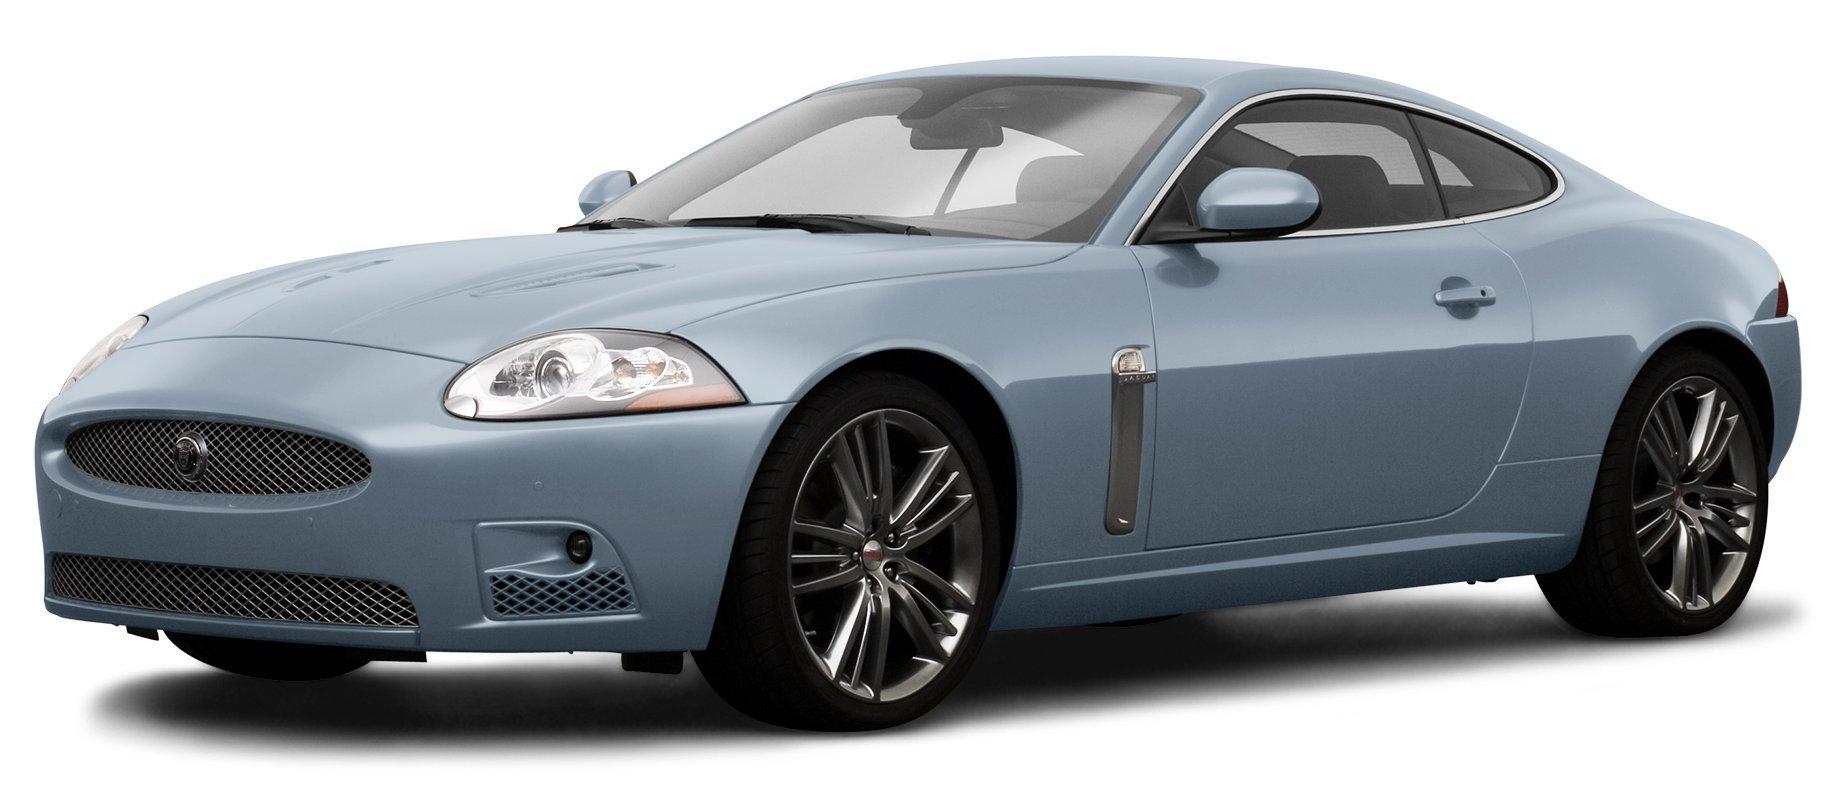 Lovely ... 2009 Jaguar XKR, 2 Door Coupe ...